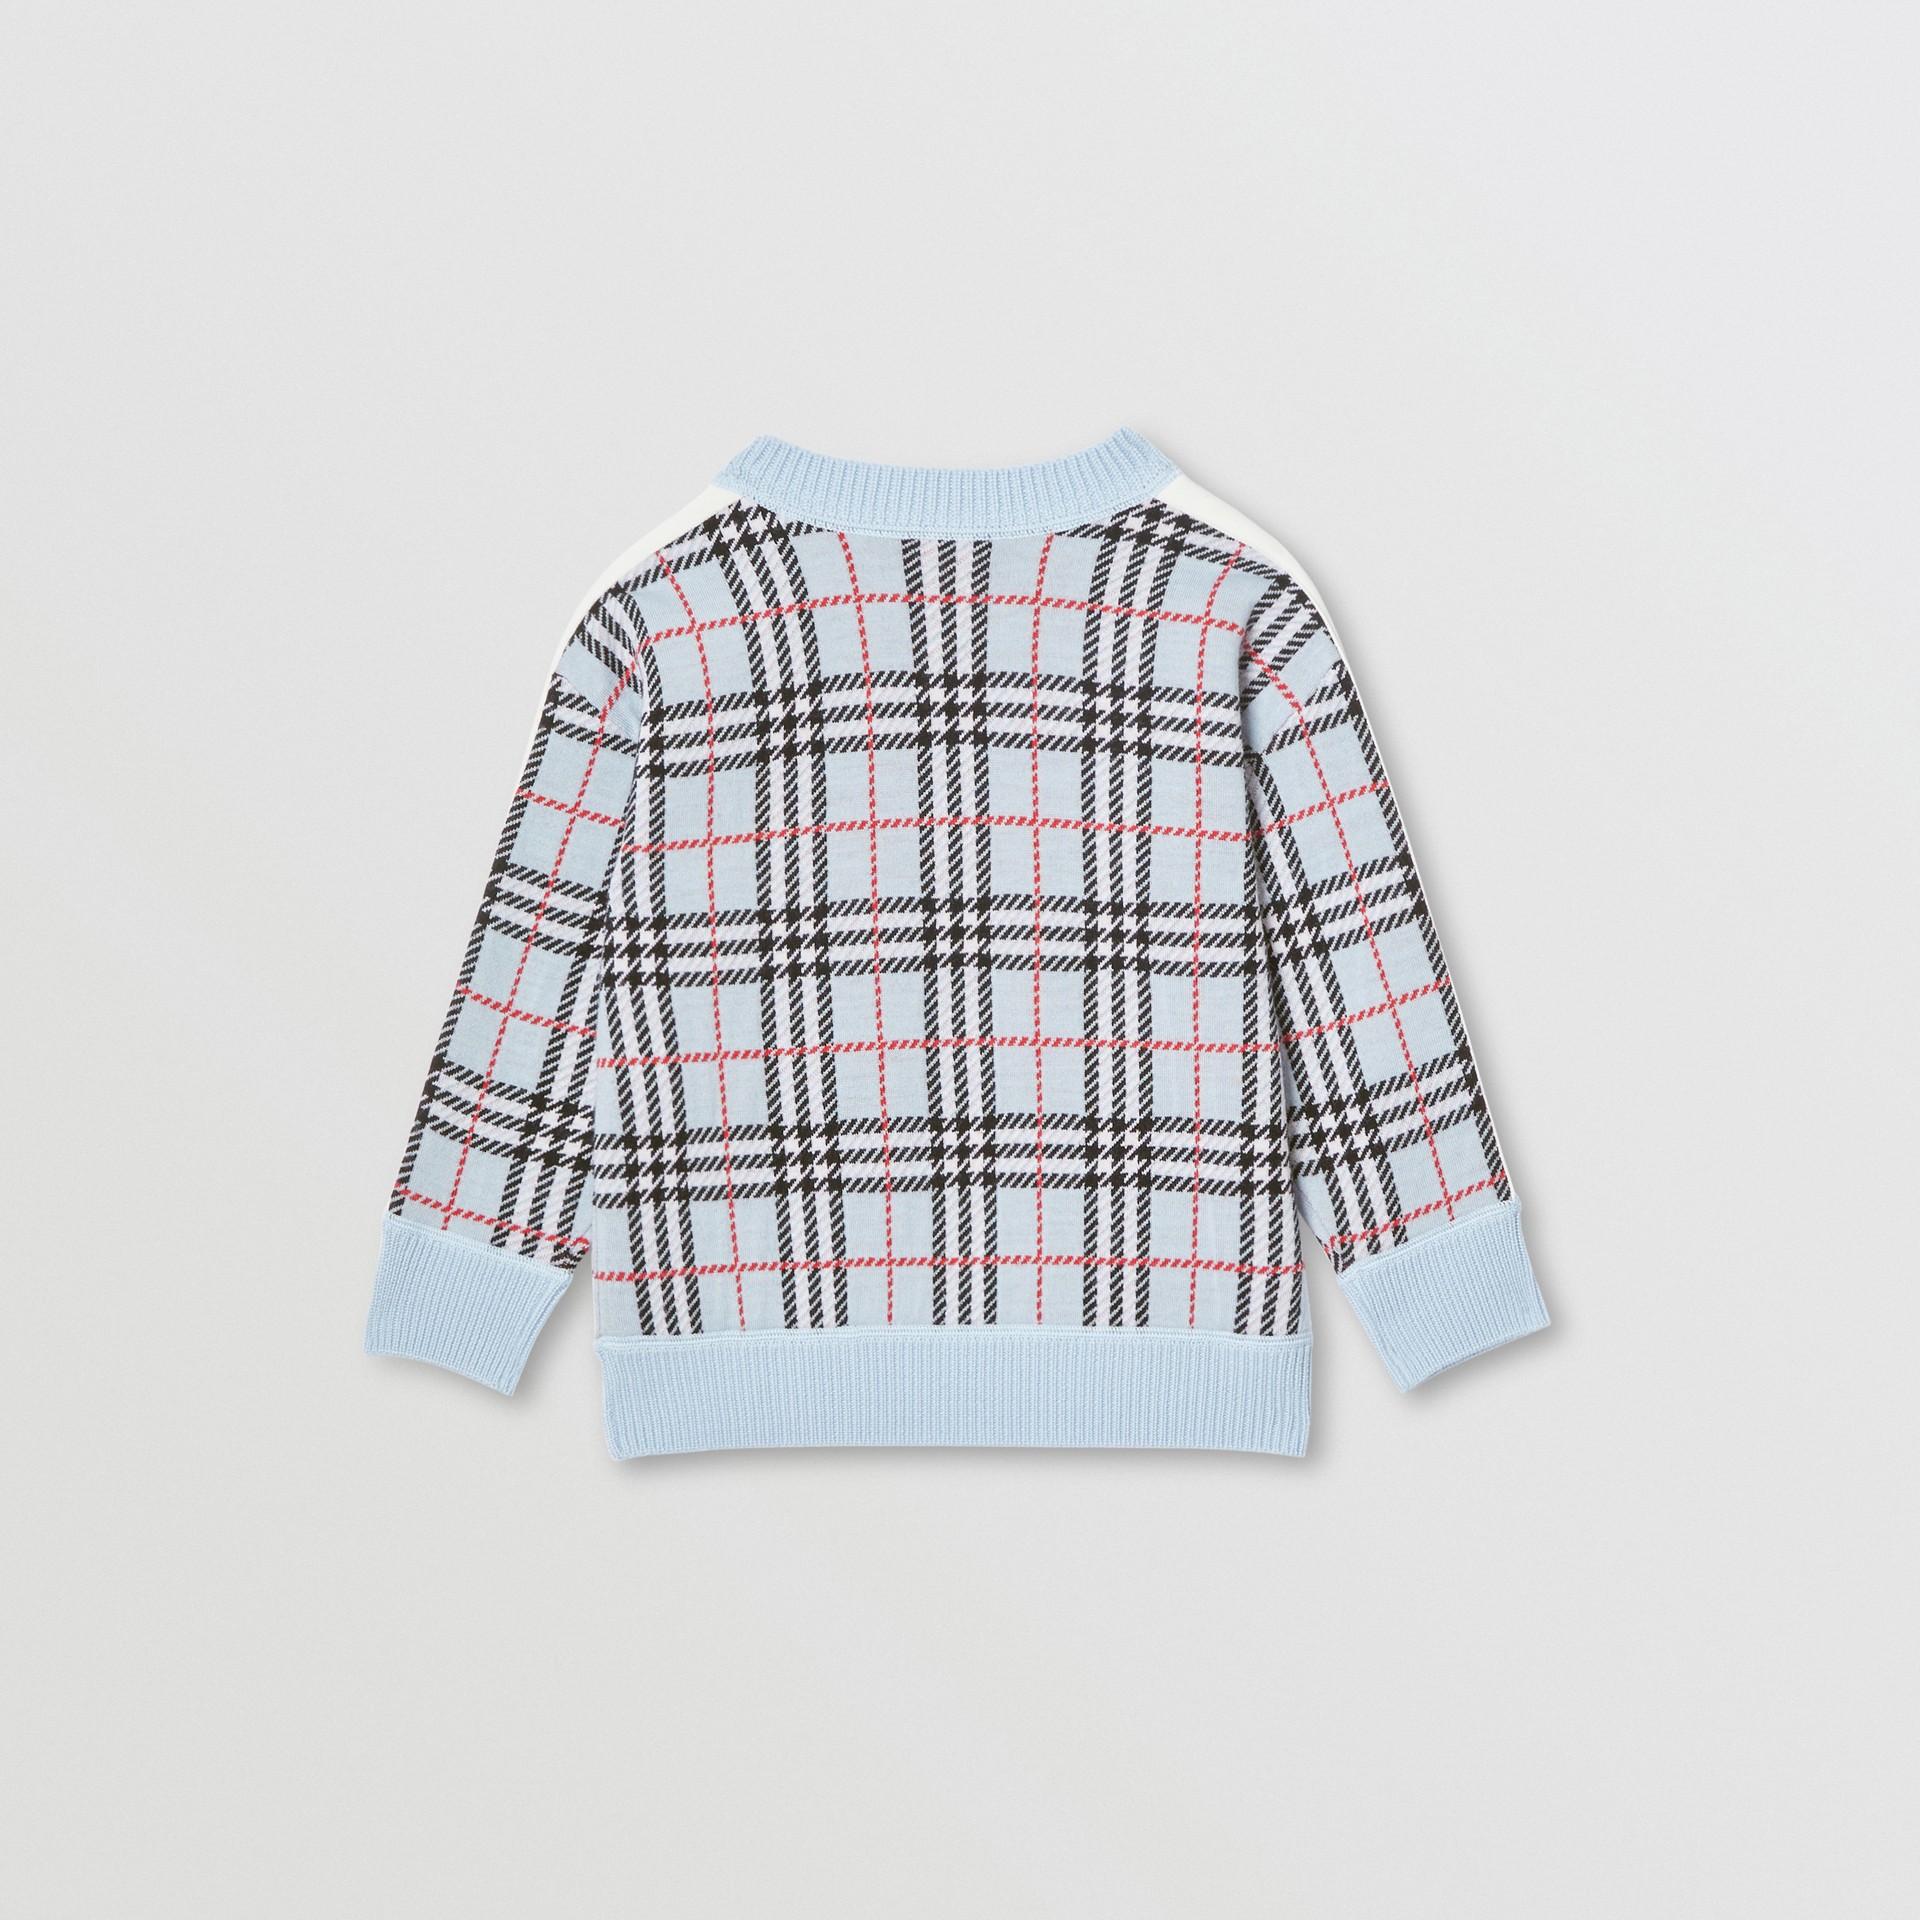 Check Merino Wool Jacquard Sweater in Pale Blue | Burberry Australia - gallery image 4